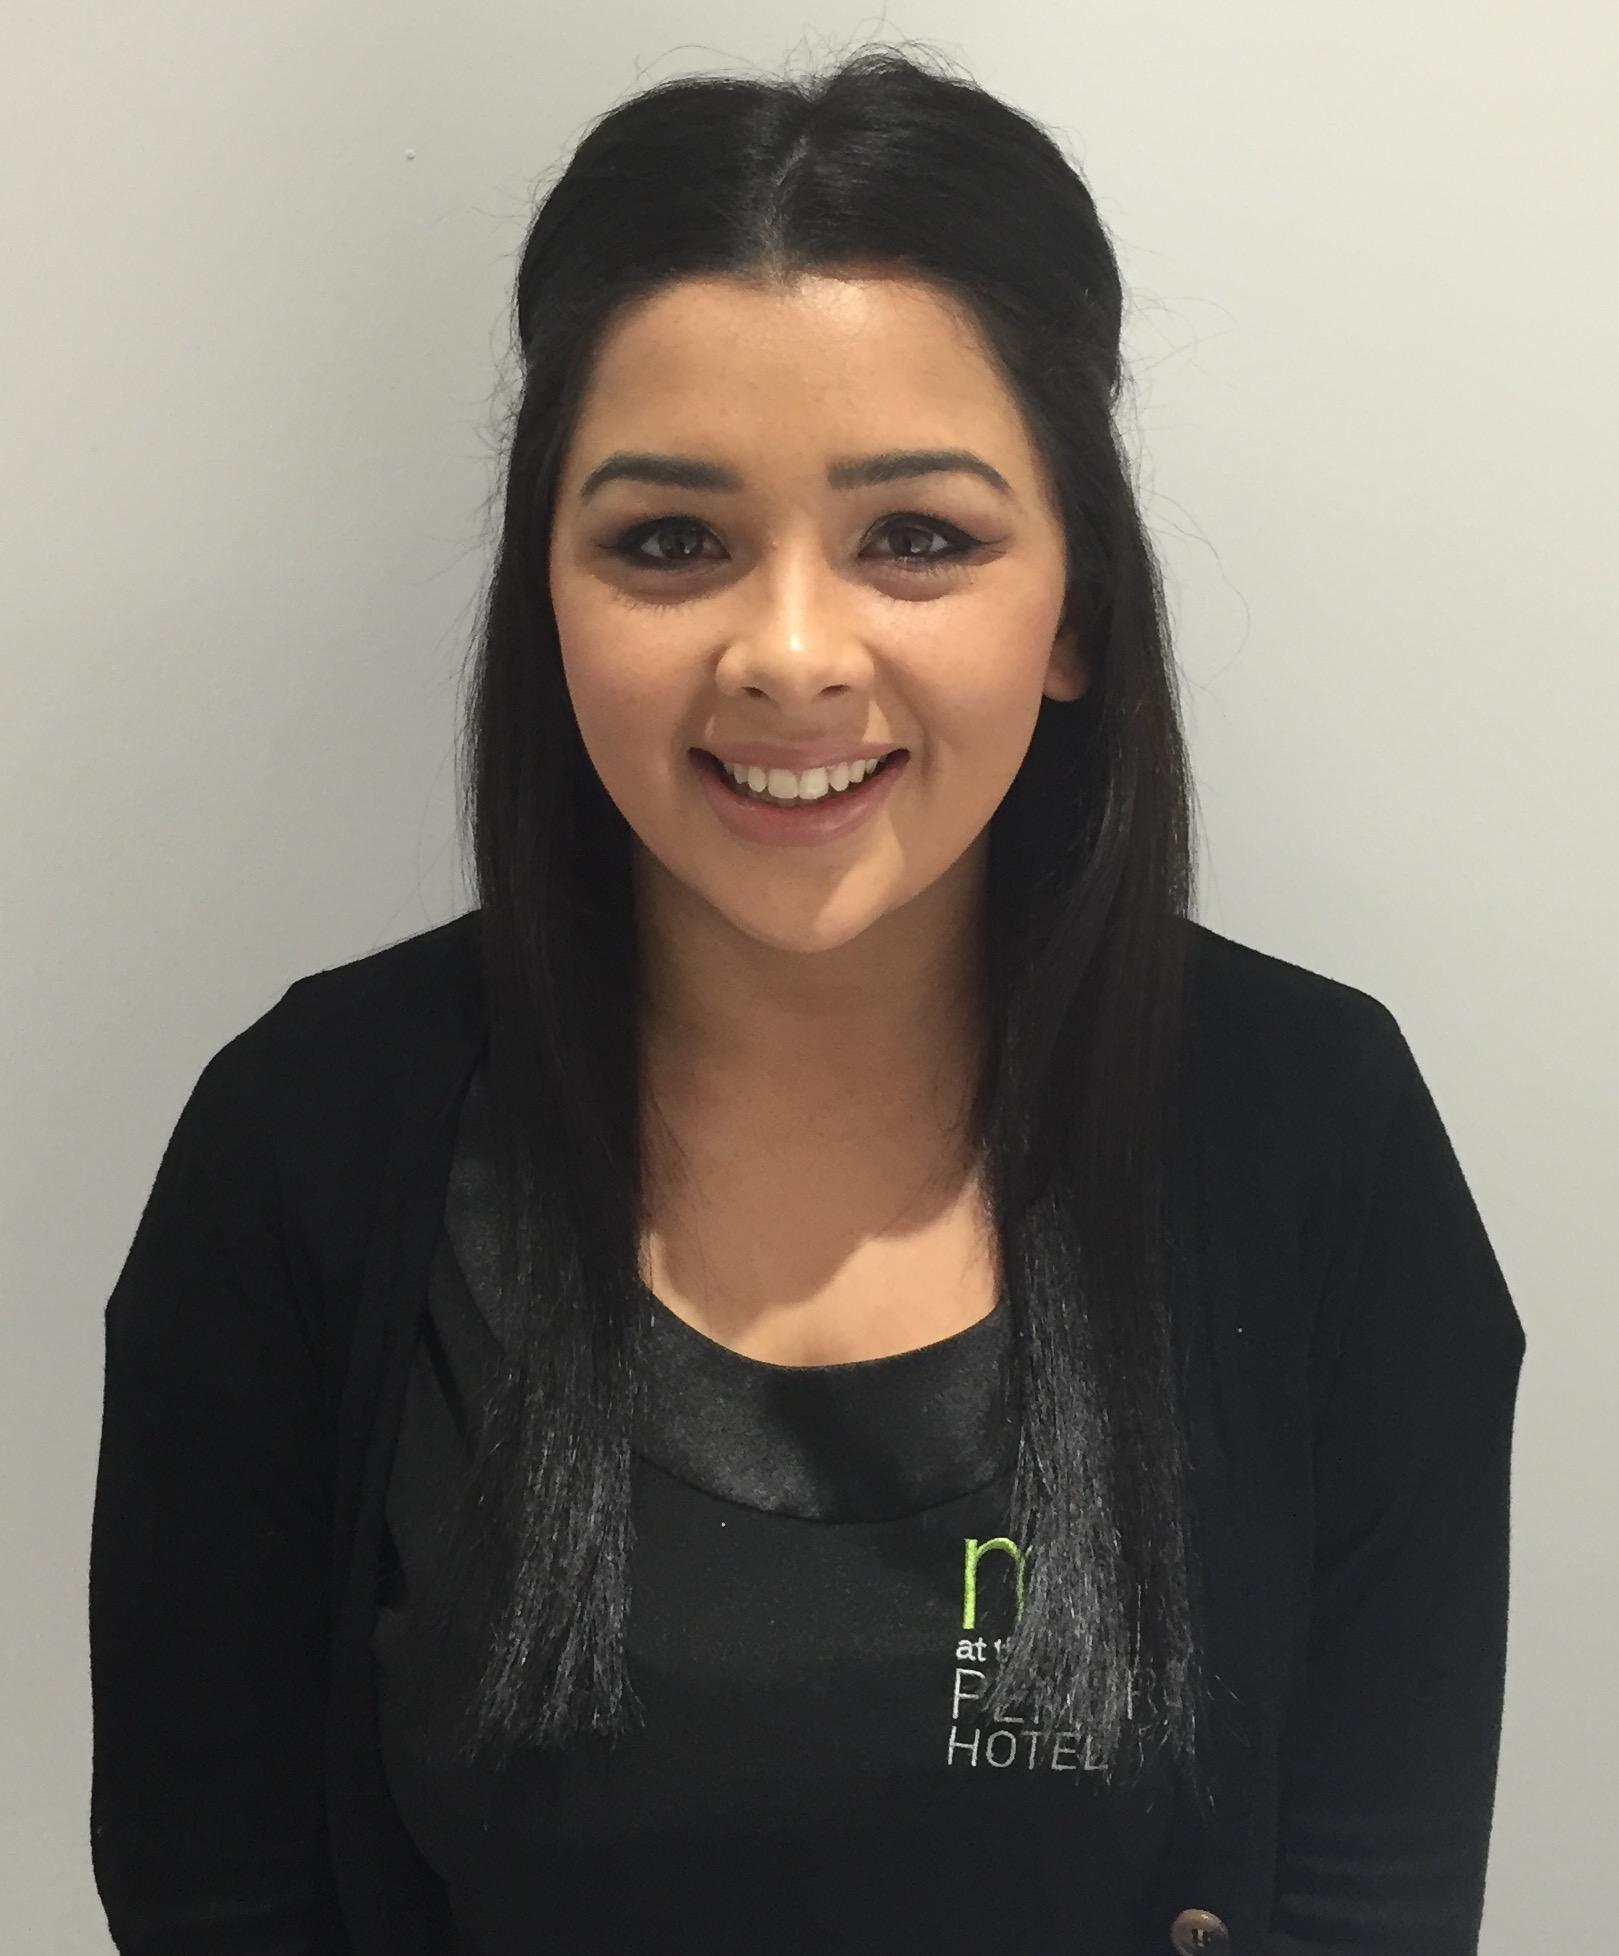 Nadine Kelly - Our Noveau Lash Expert